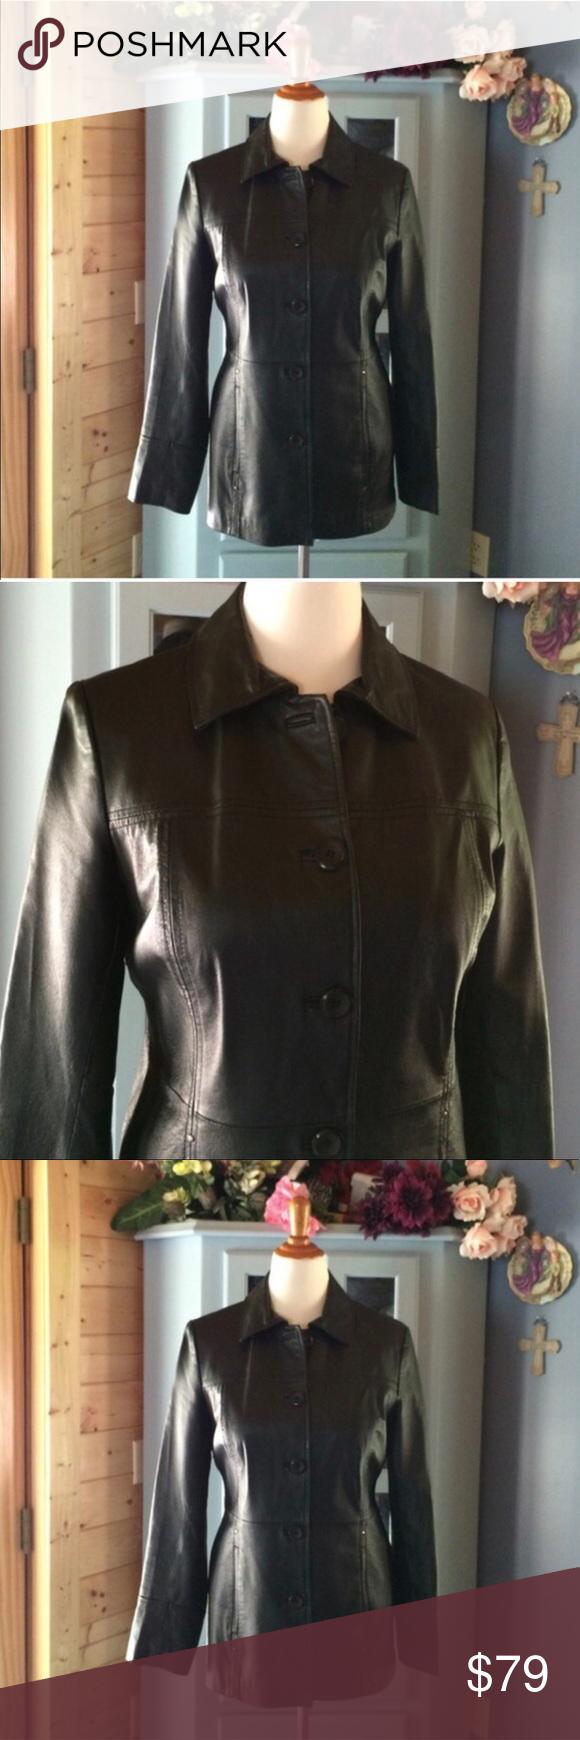 EAST 5th Black LEATHER Coat. Brand NEW!! Stunning! Brand